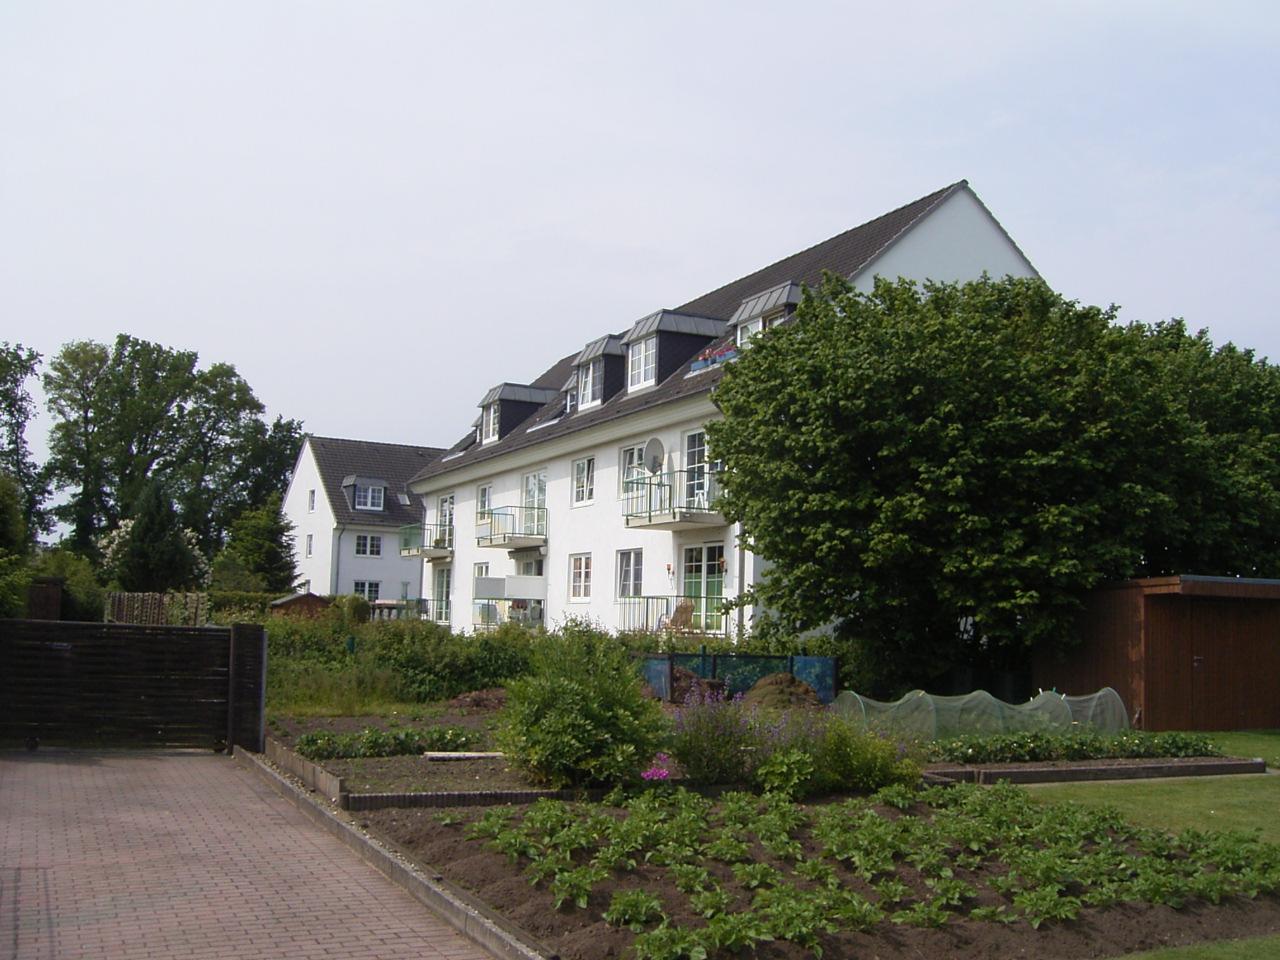 Mietwohnung vermietung 2zimmer preis 320 1050 for Immobilien mietwohnung